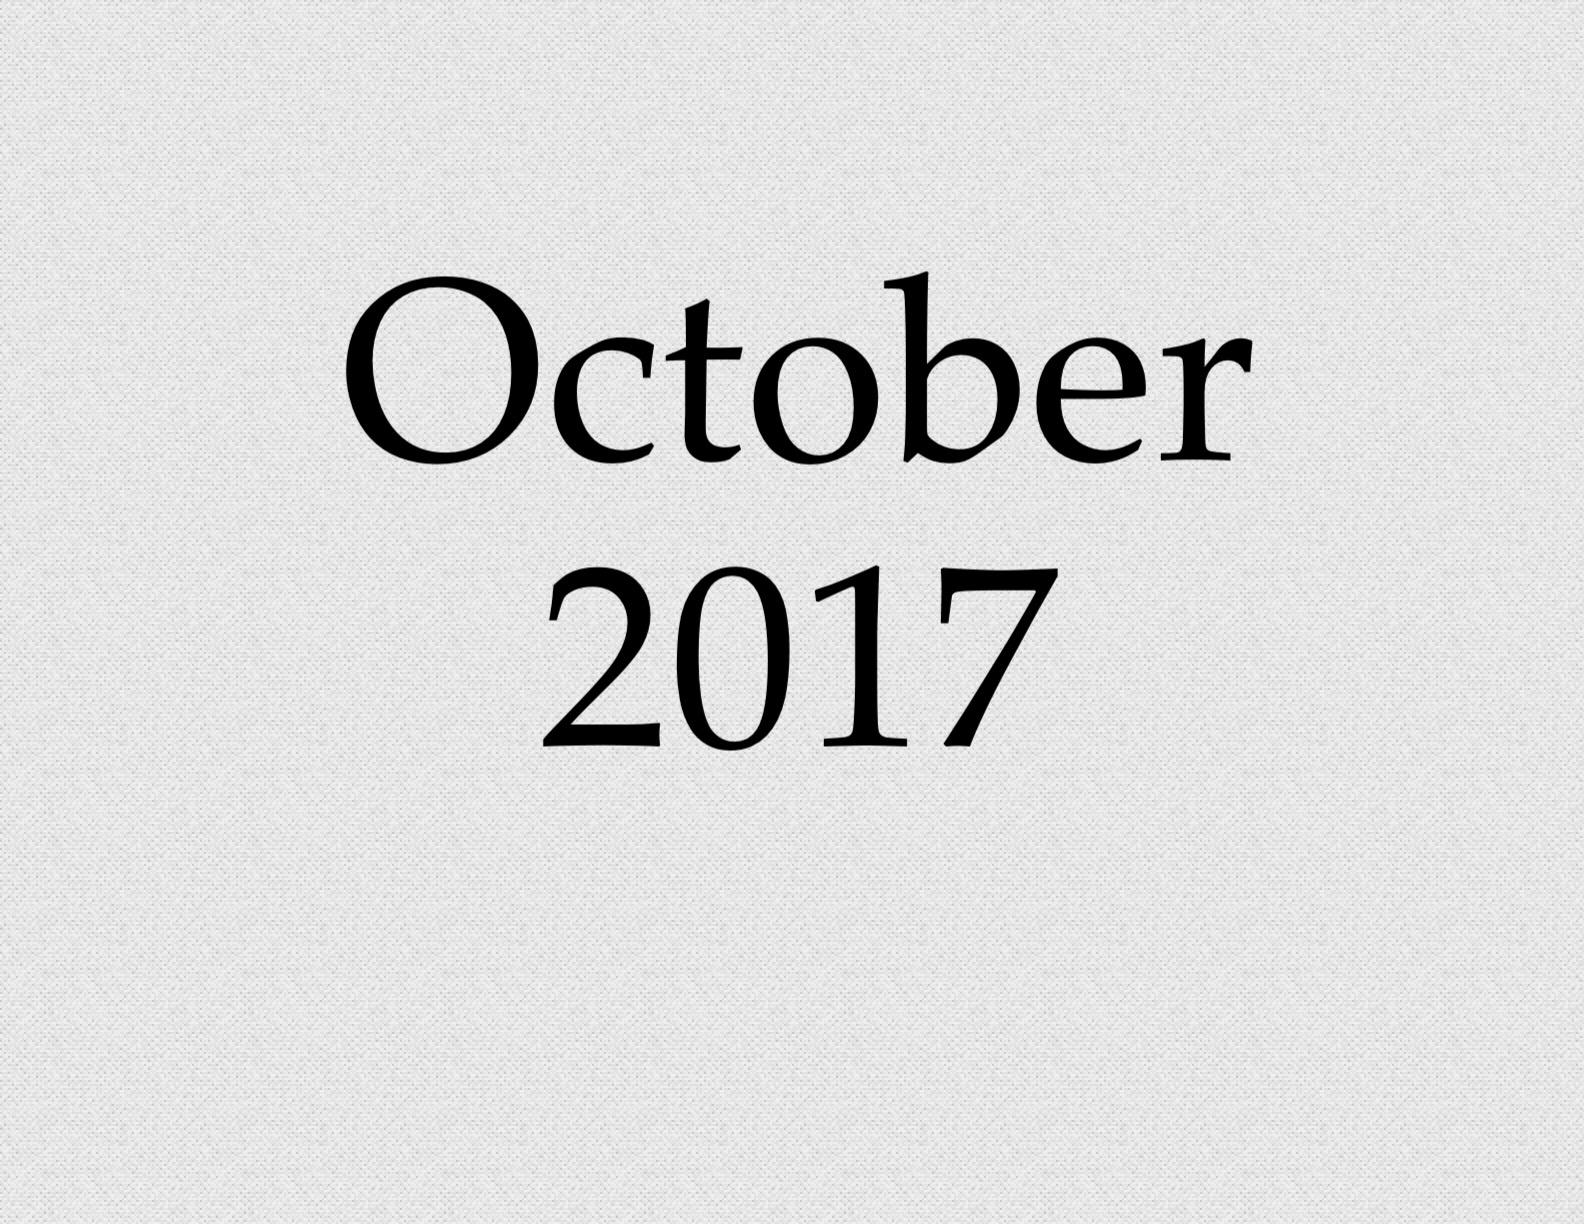 Photo Oct 02, 10 56 01 AM.jpg